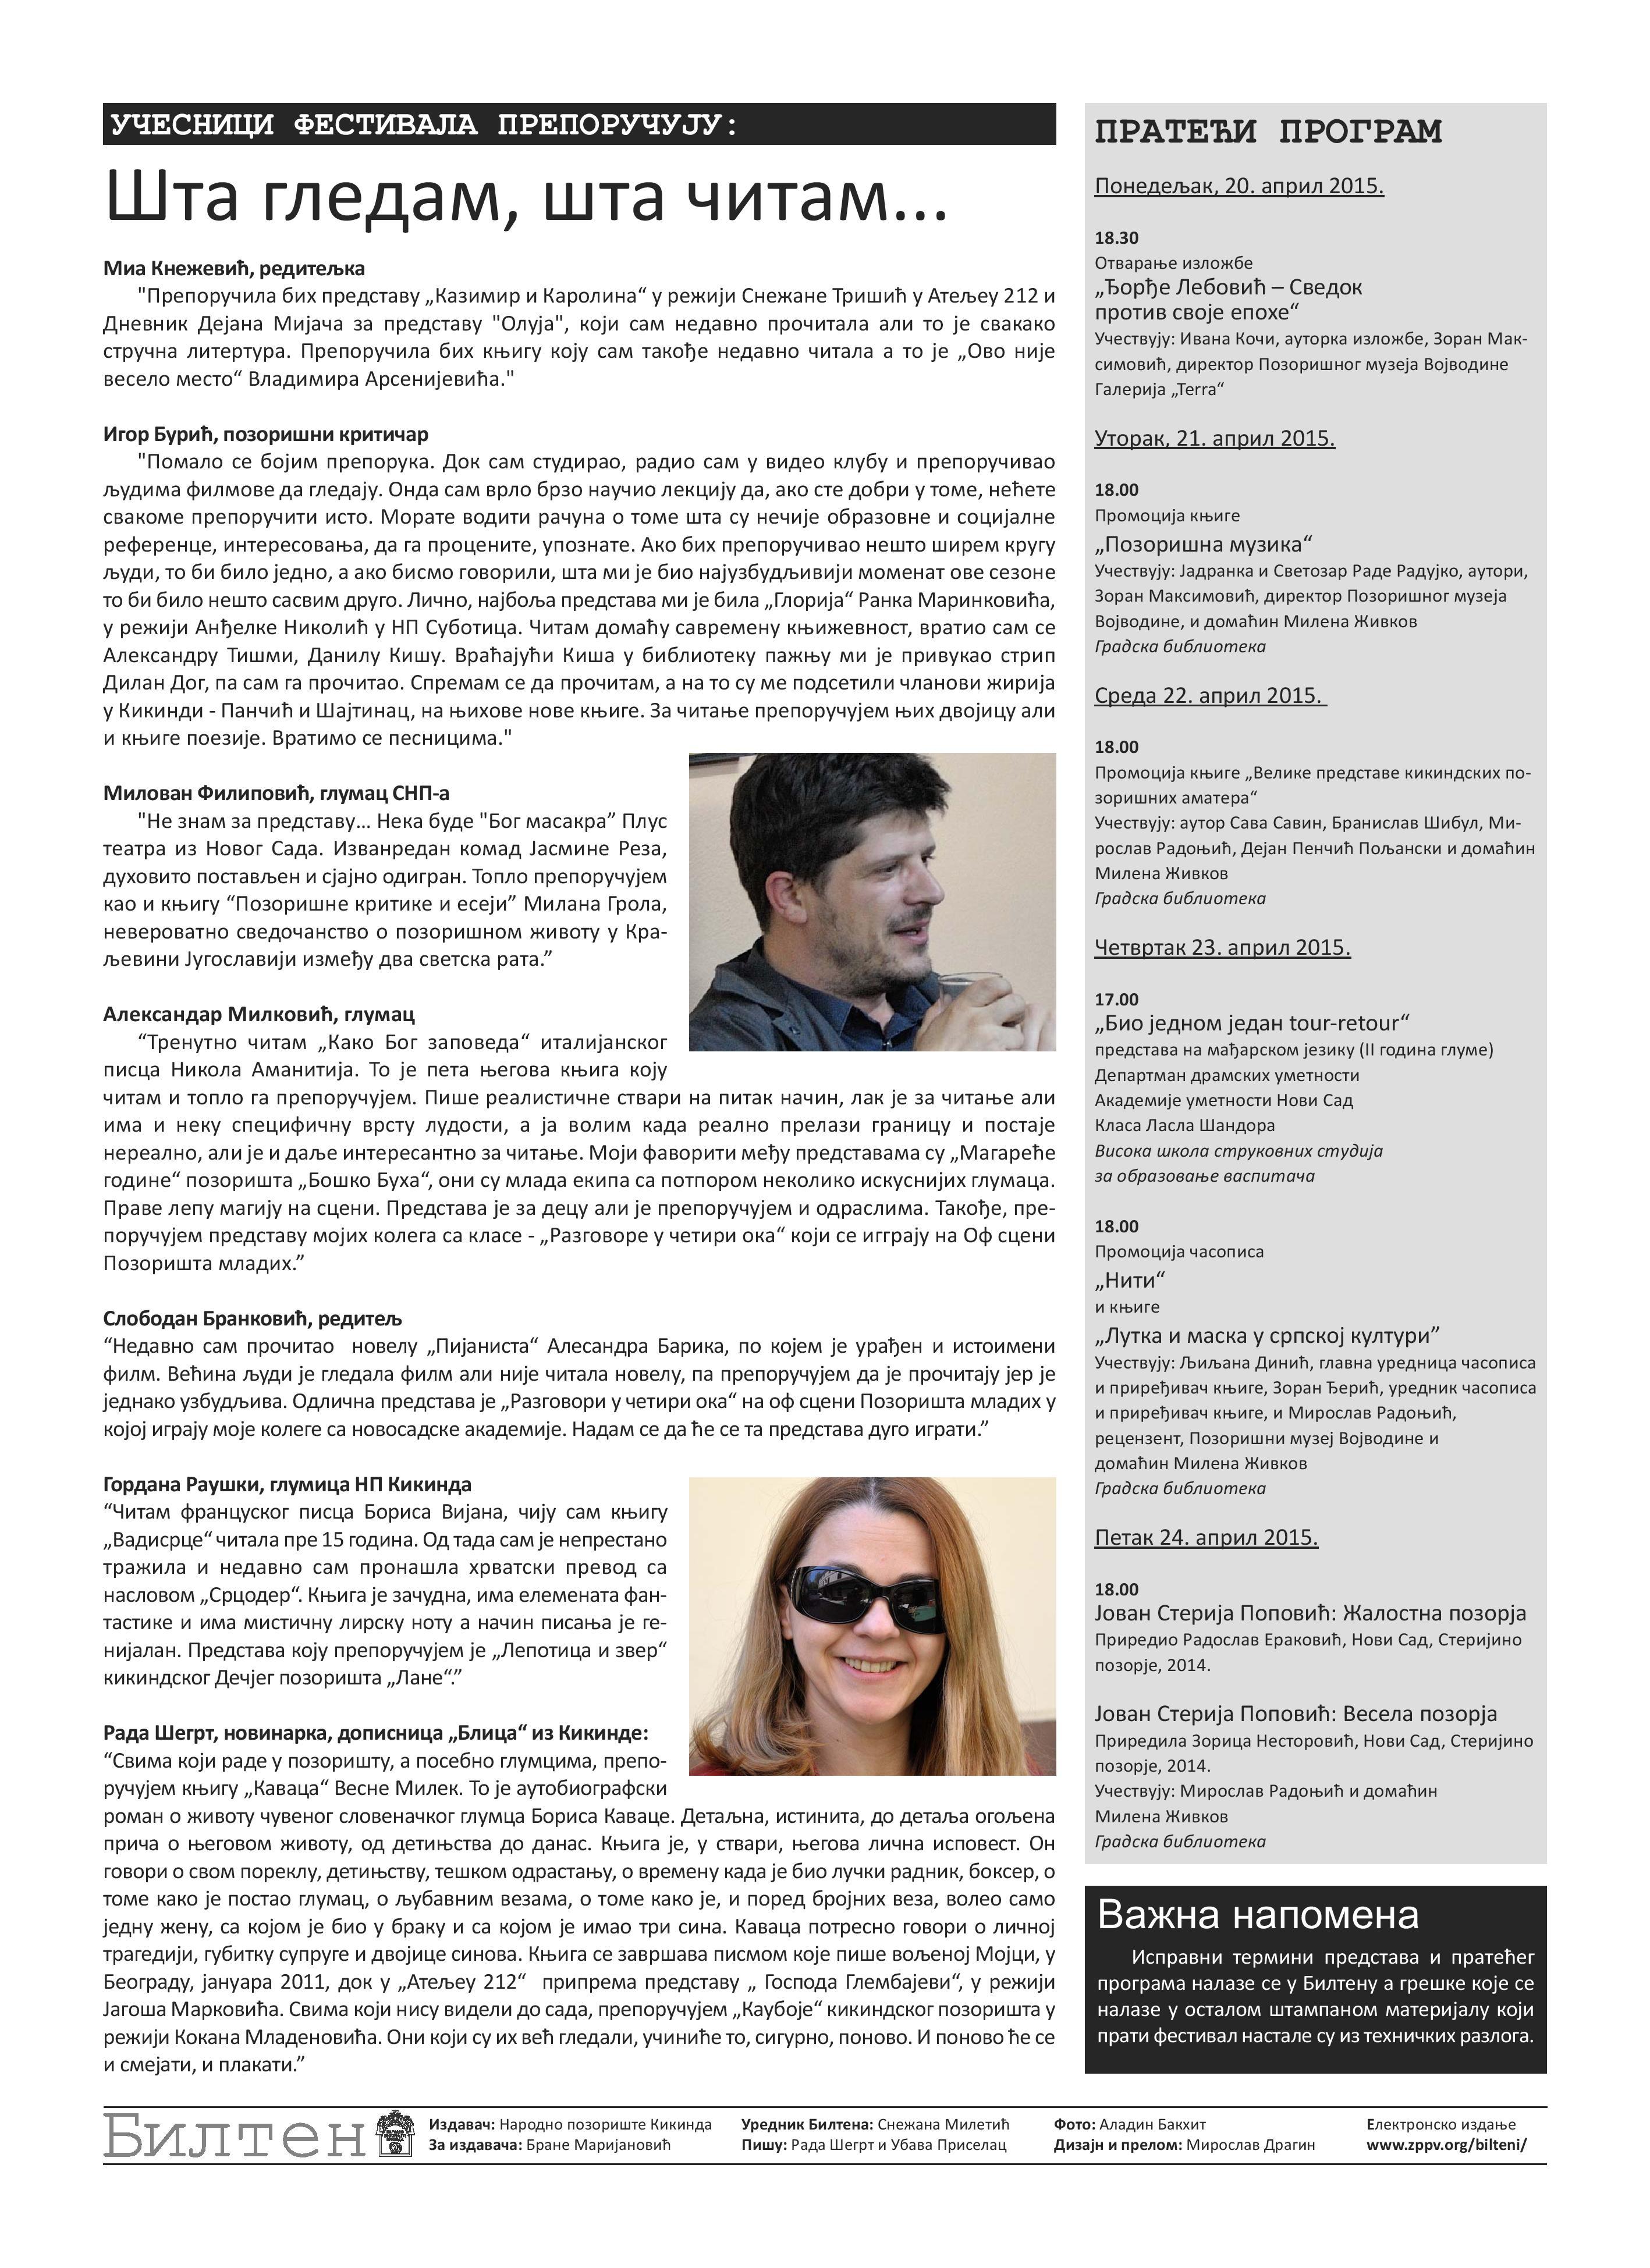 BILTEN_04_23 april_Copy of Layout 2-page-009